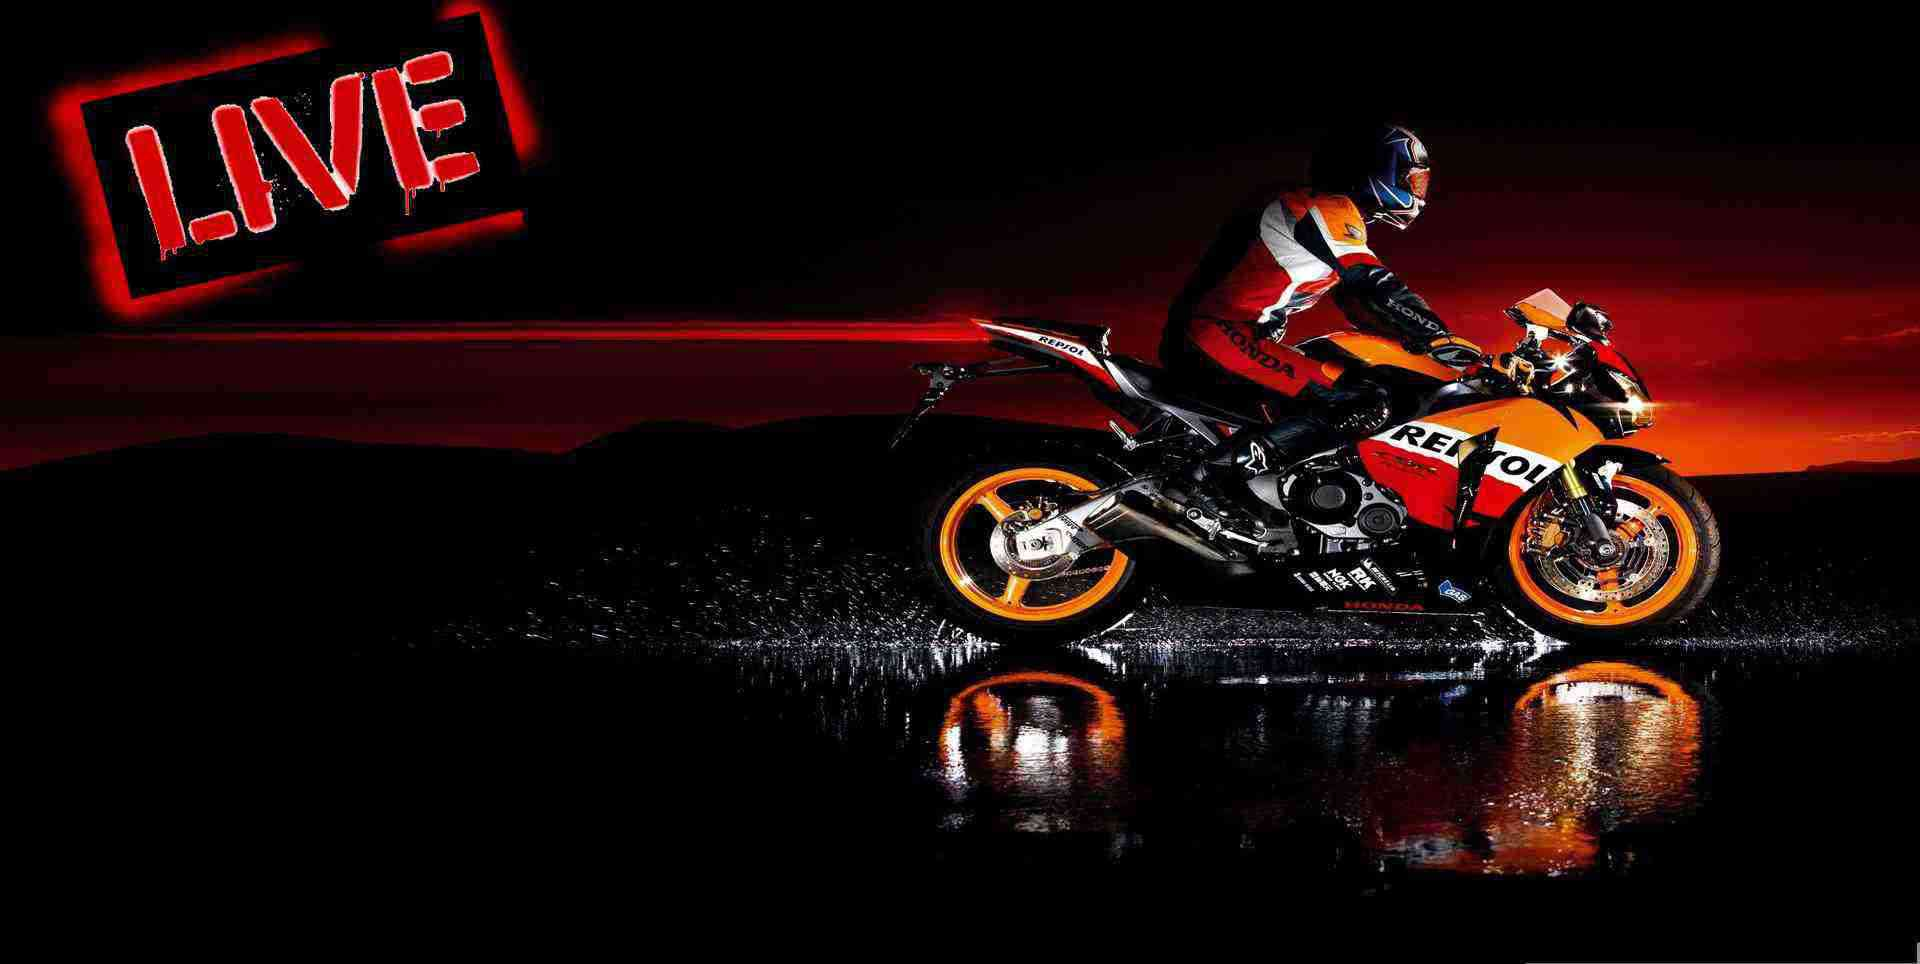 2016-utah-motoamerica-superbike-live